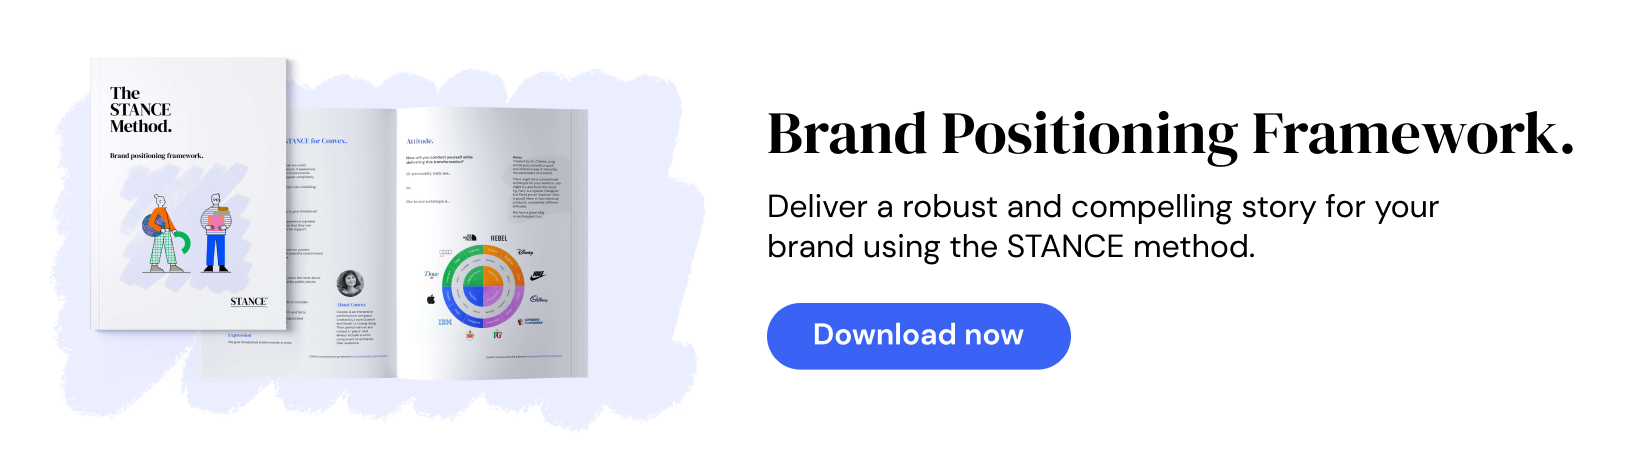 STANCE brand positioning framework